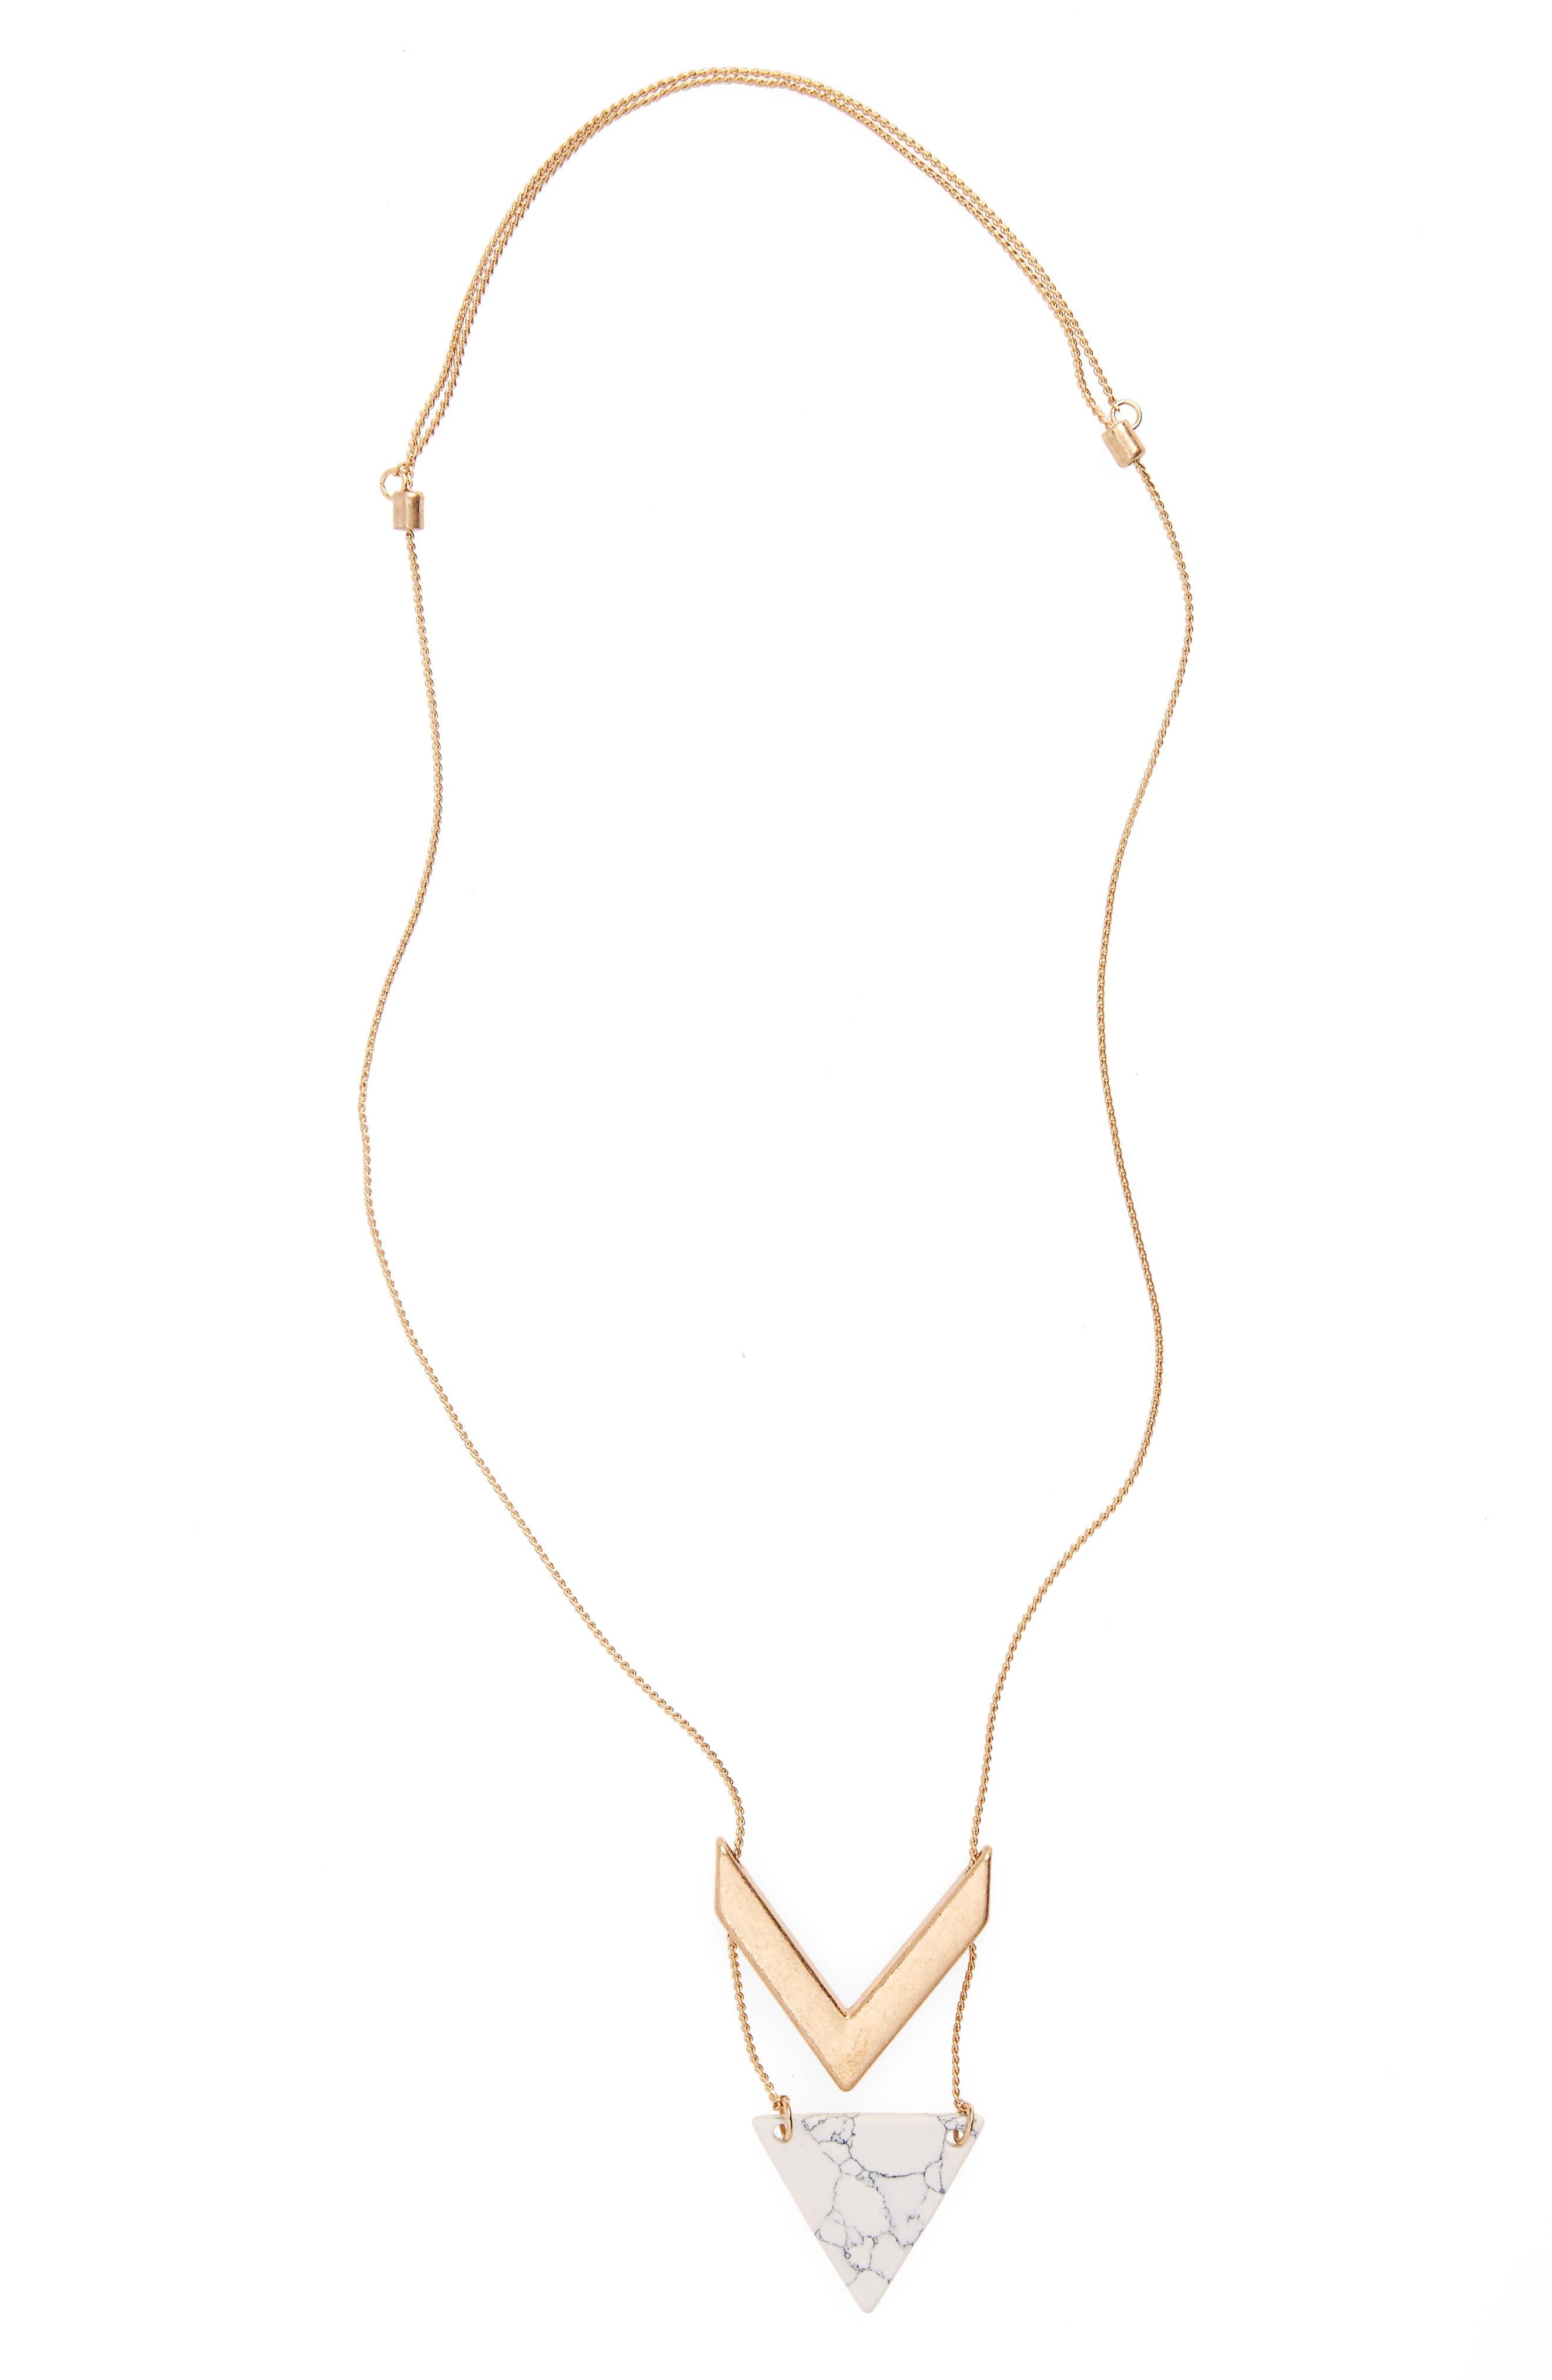 Girly Stone & Chevron Pendant Necklace